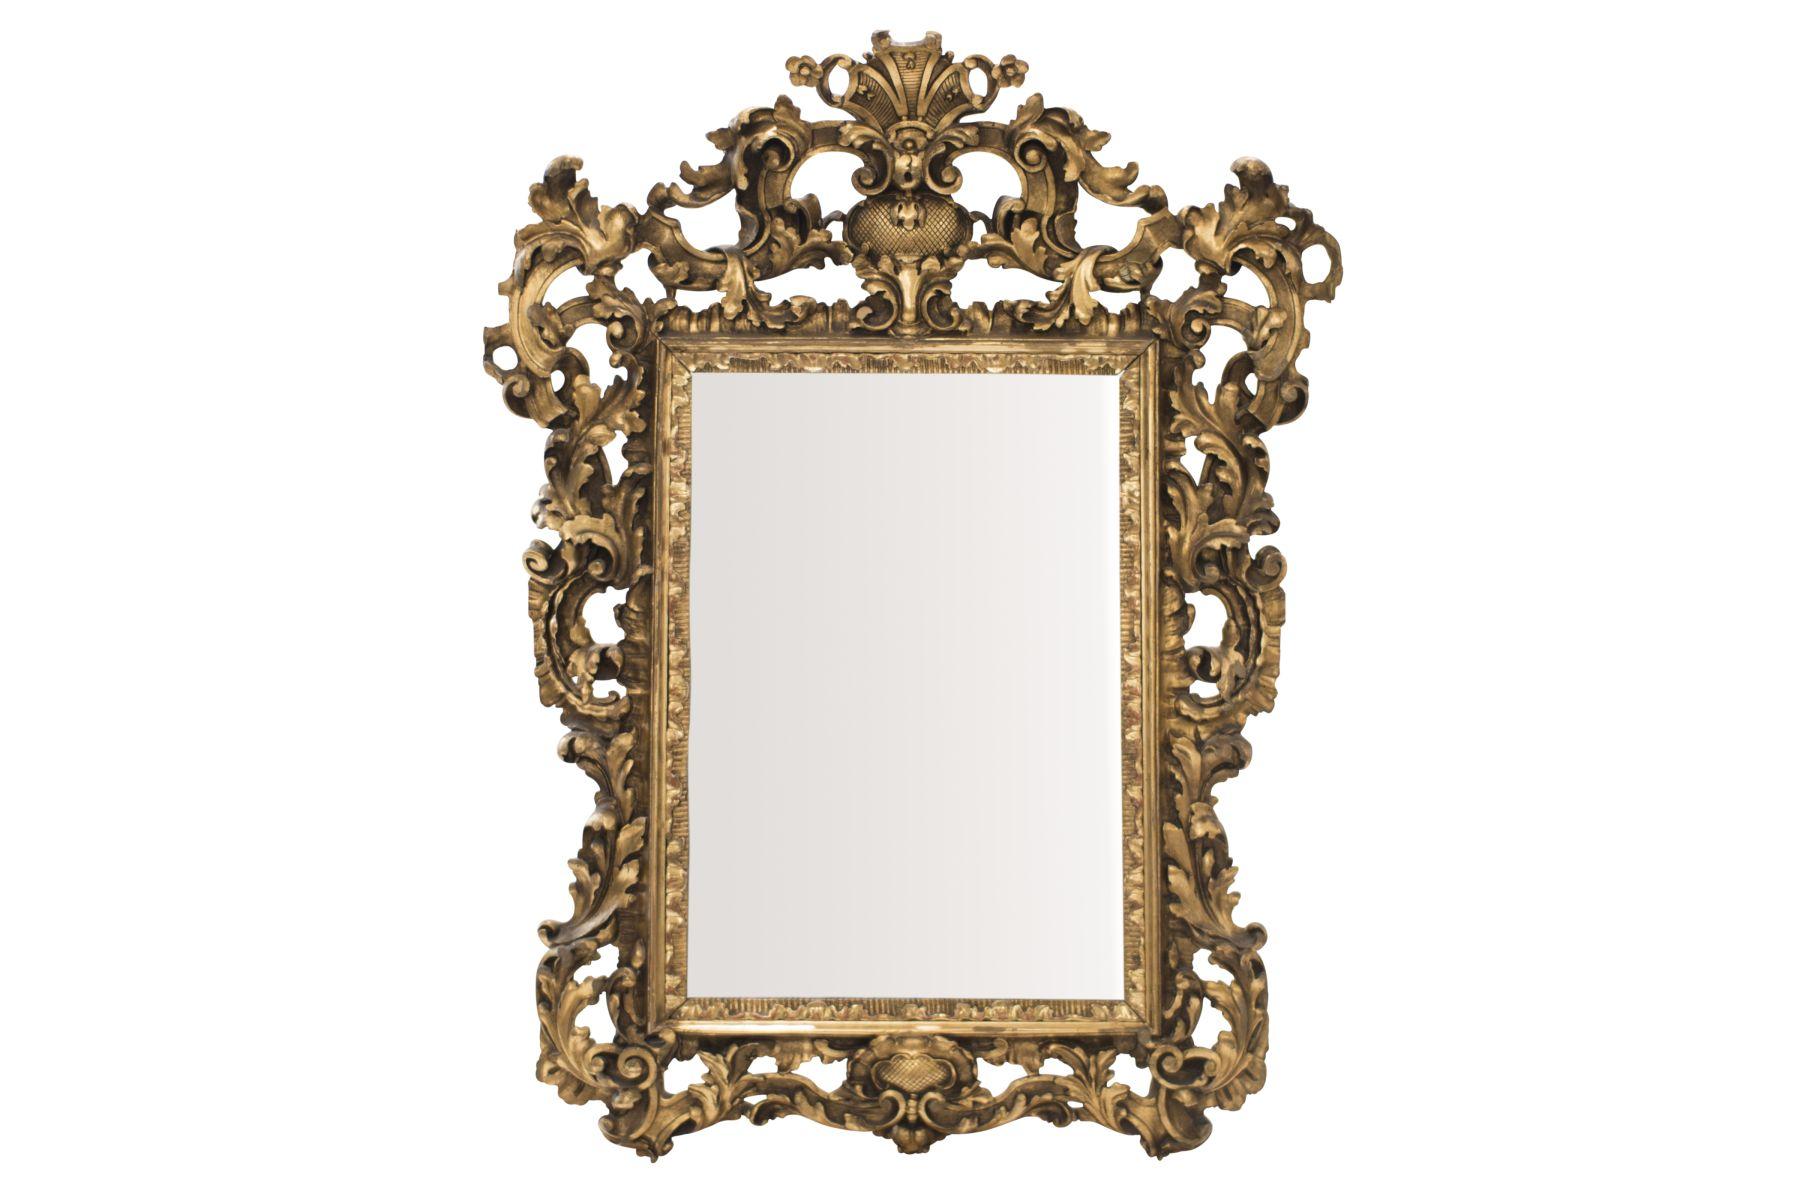 #59 Baroque style salon mirror, 19th century | Barockstil Salonspiegel, 19. Jahrhundert Image